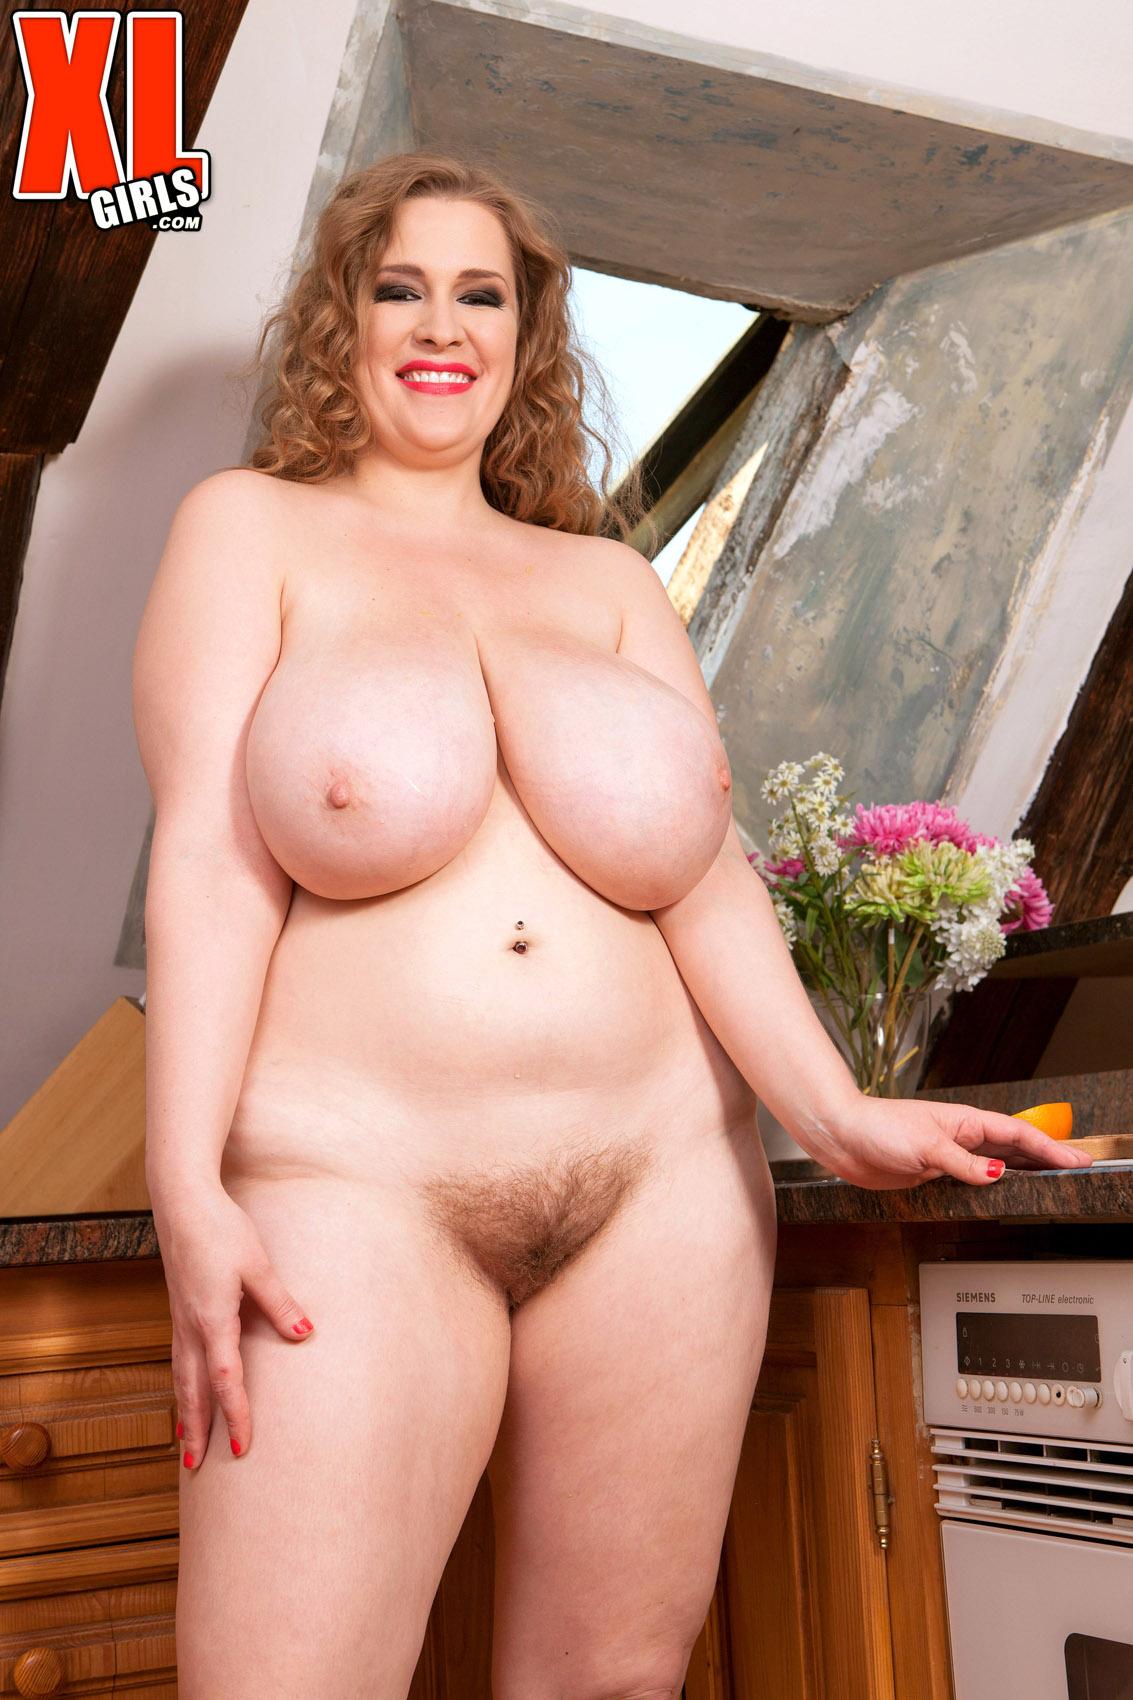 xl girls nude